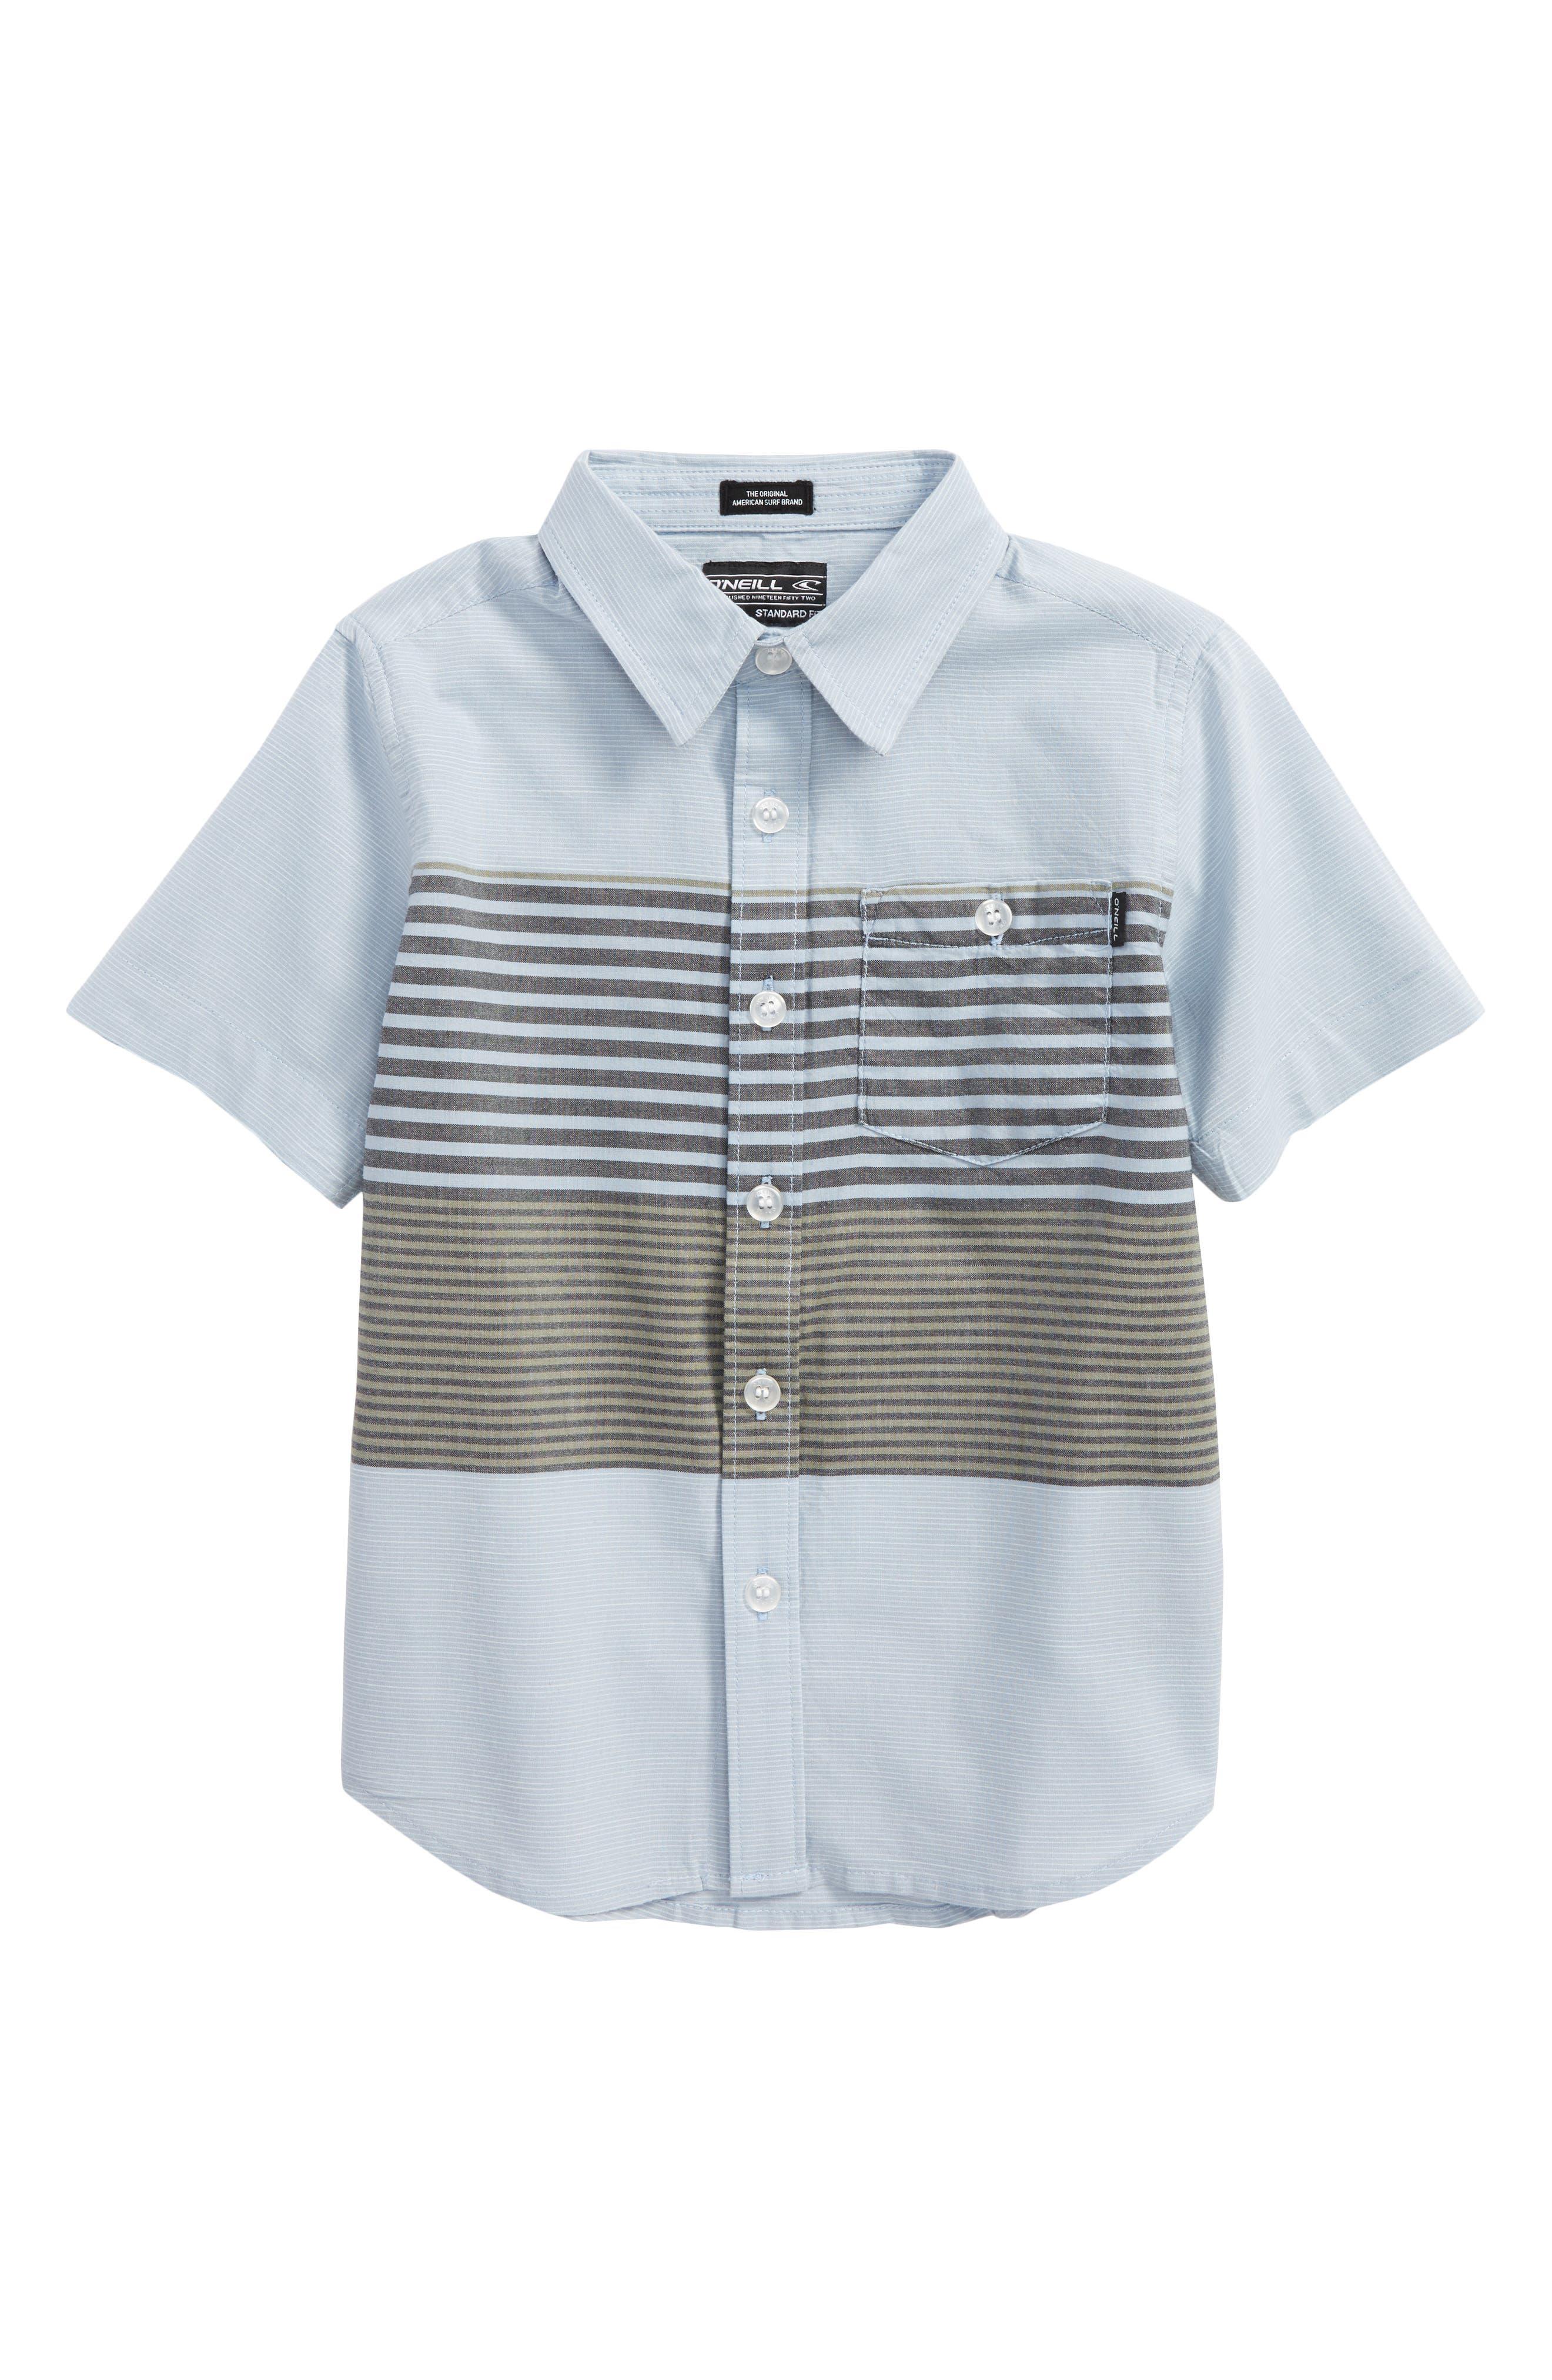 Altair Woven Shirt,                         Main,                         color, Light Blue